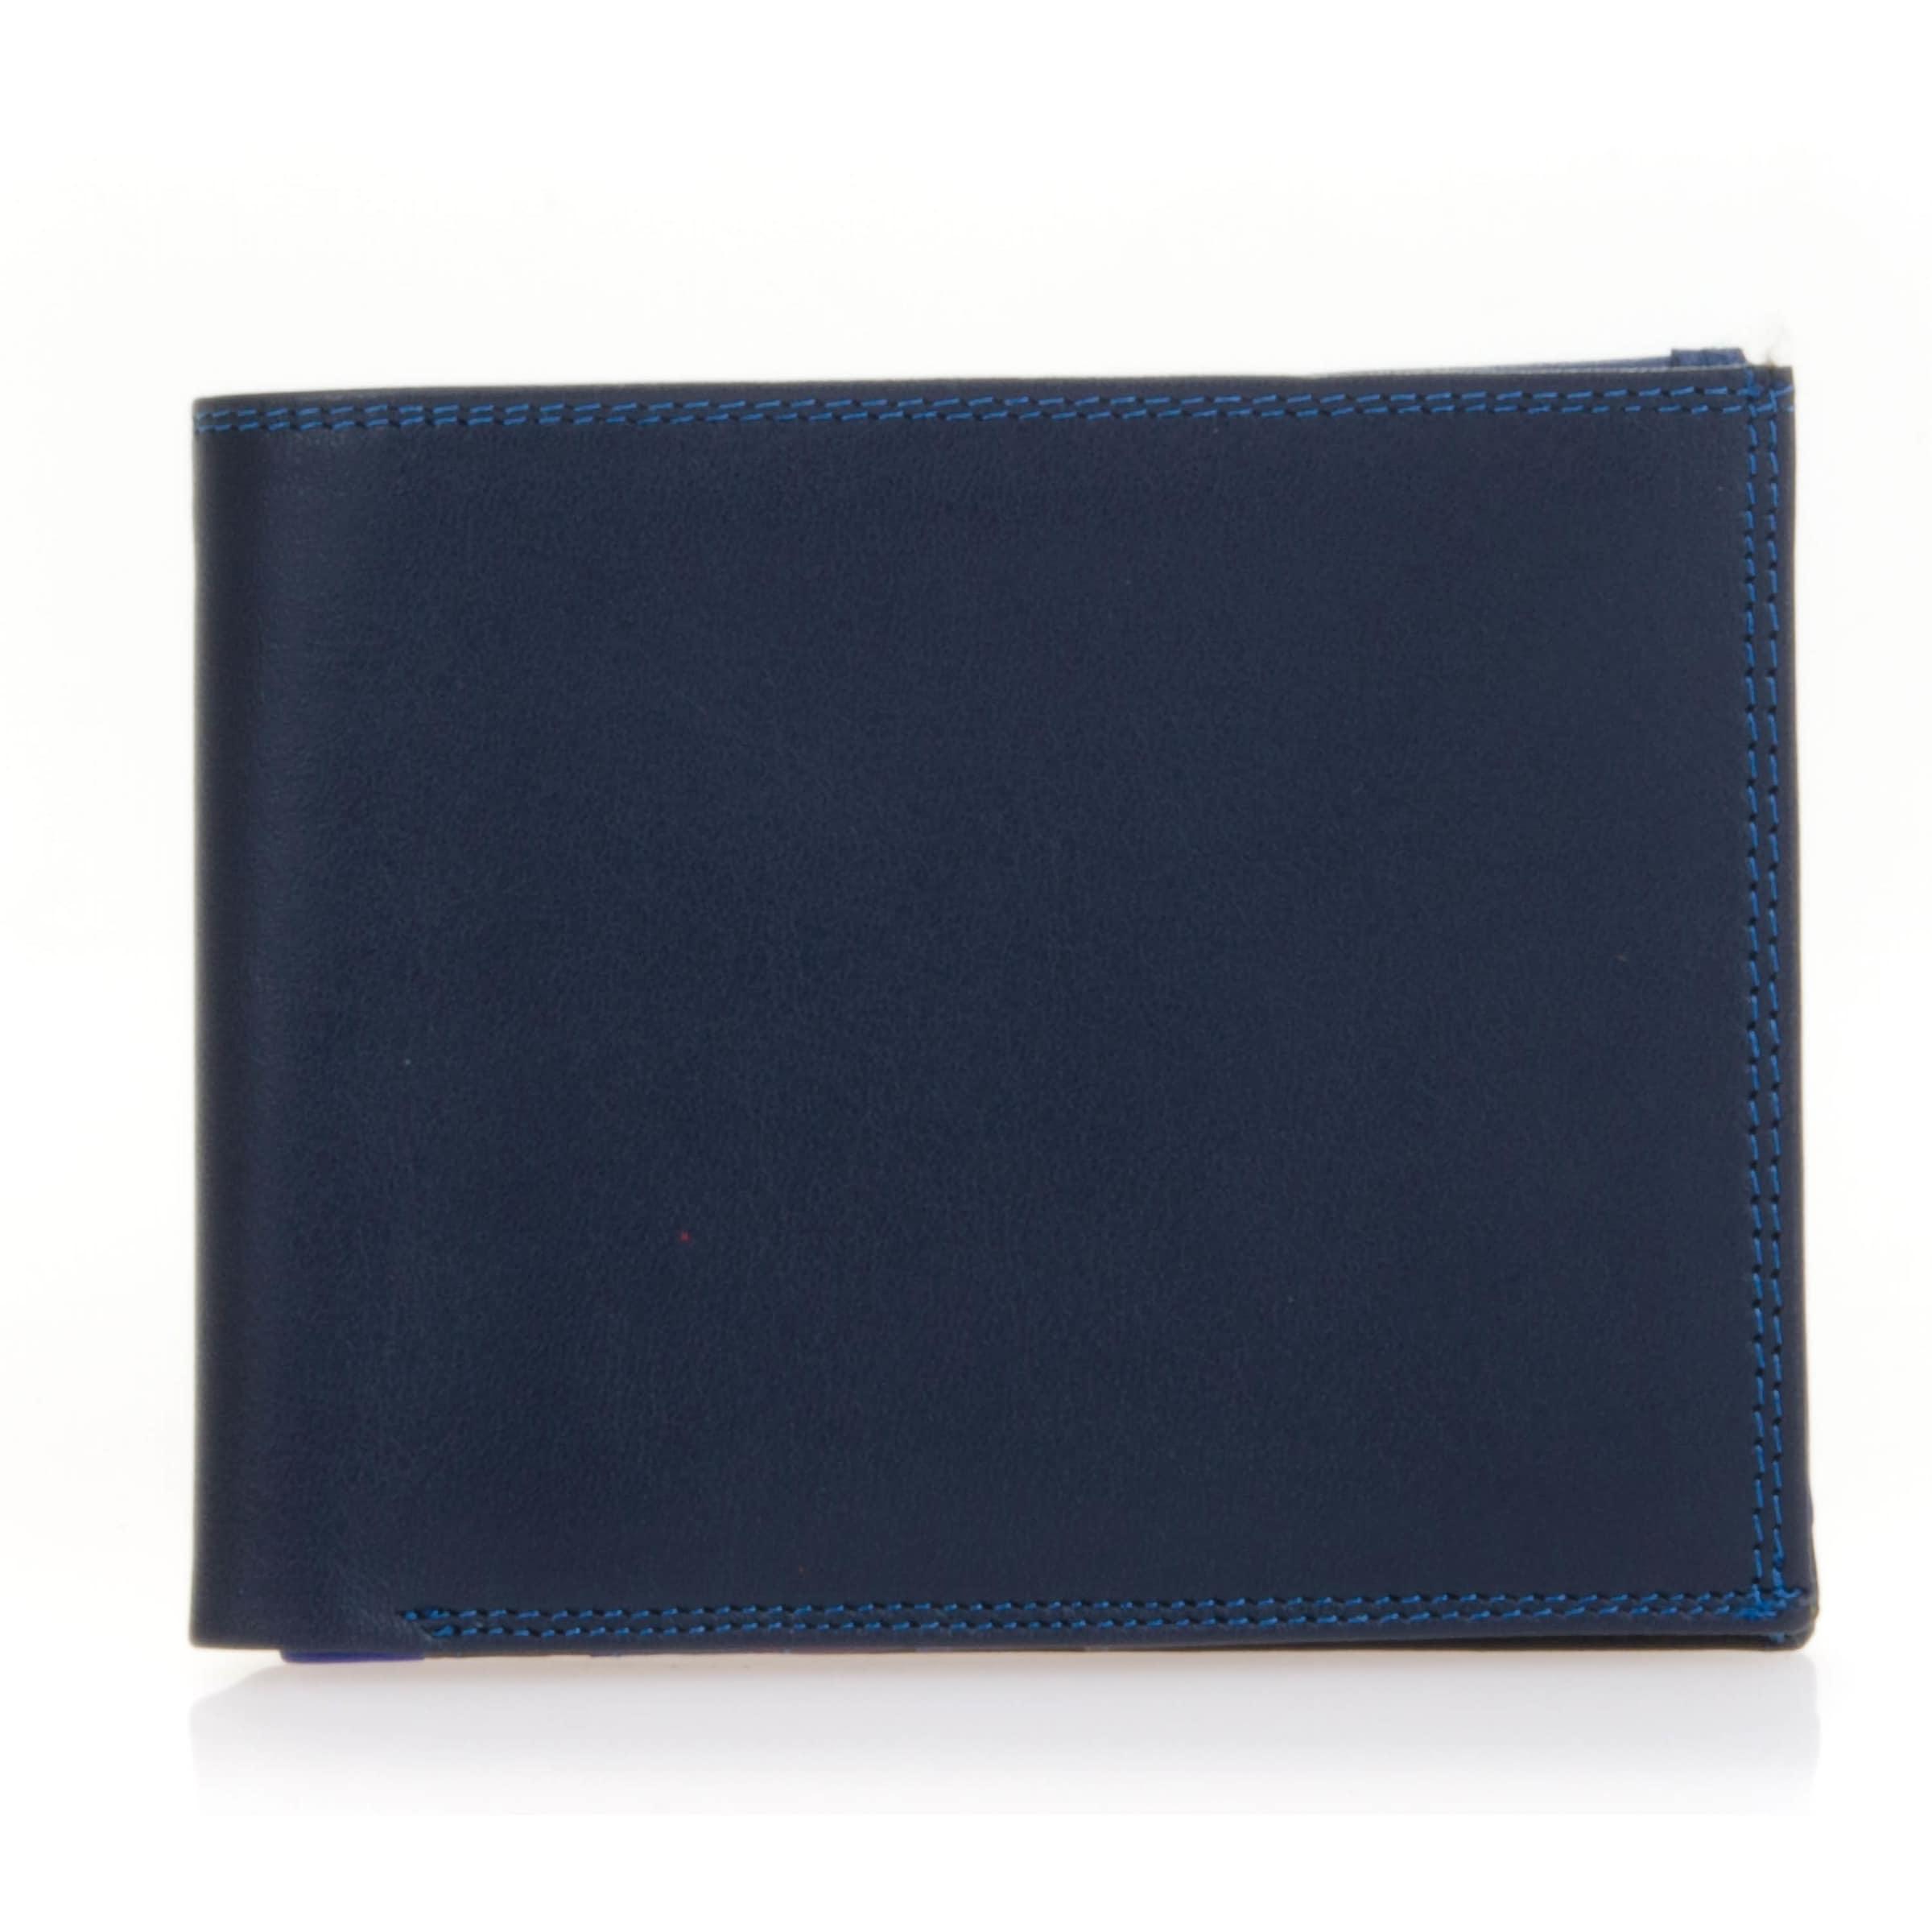 Geldbörse In Nachtblau BlauMarine Mywalit Dunkellila eDIHY9bWE2